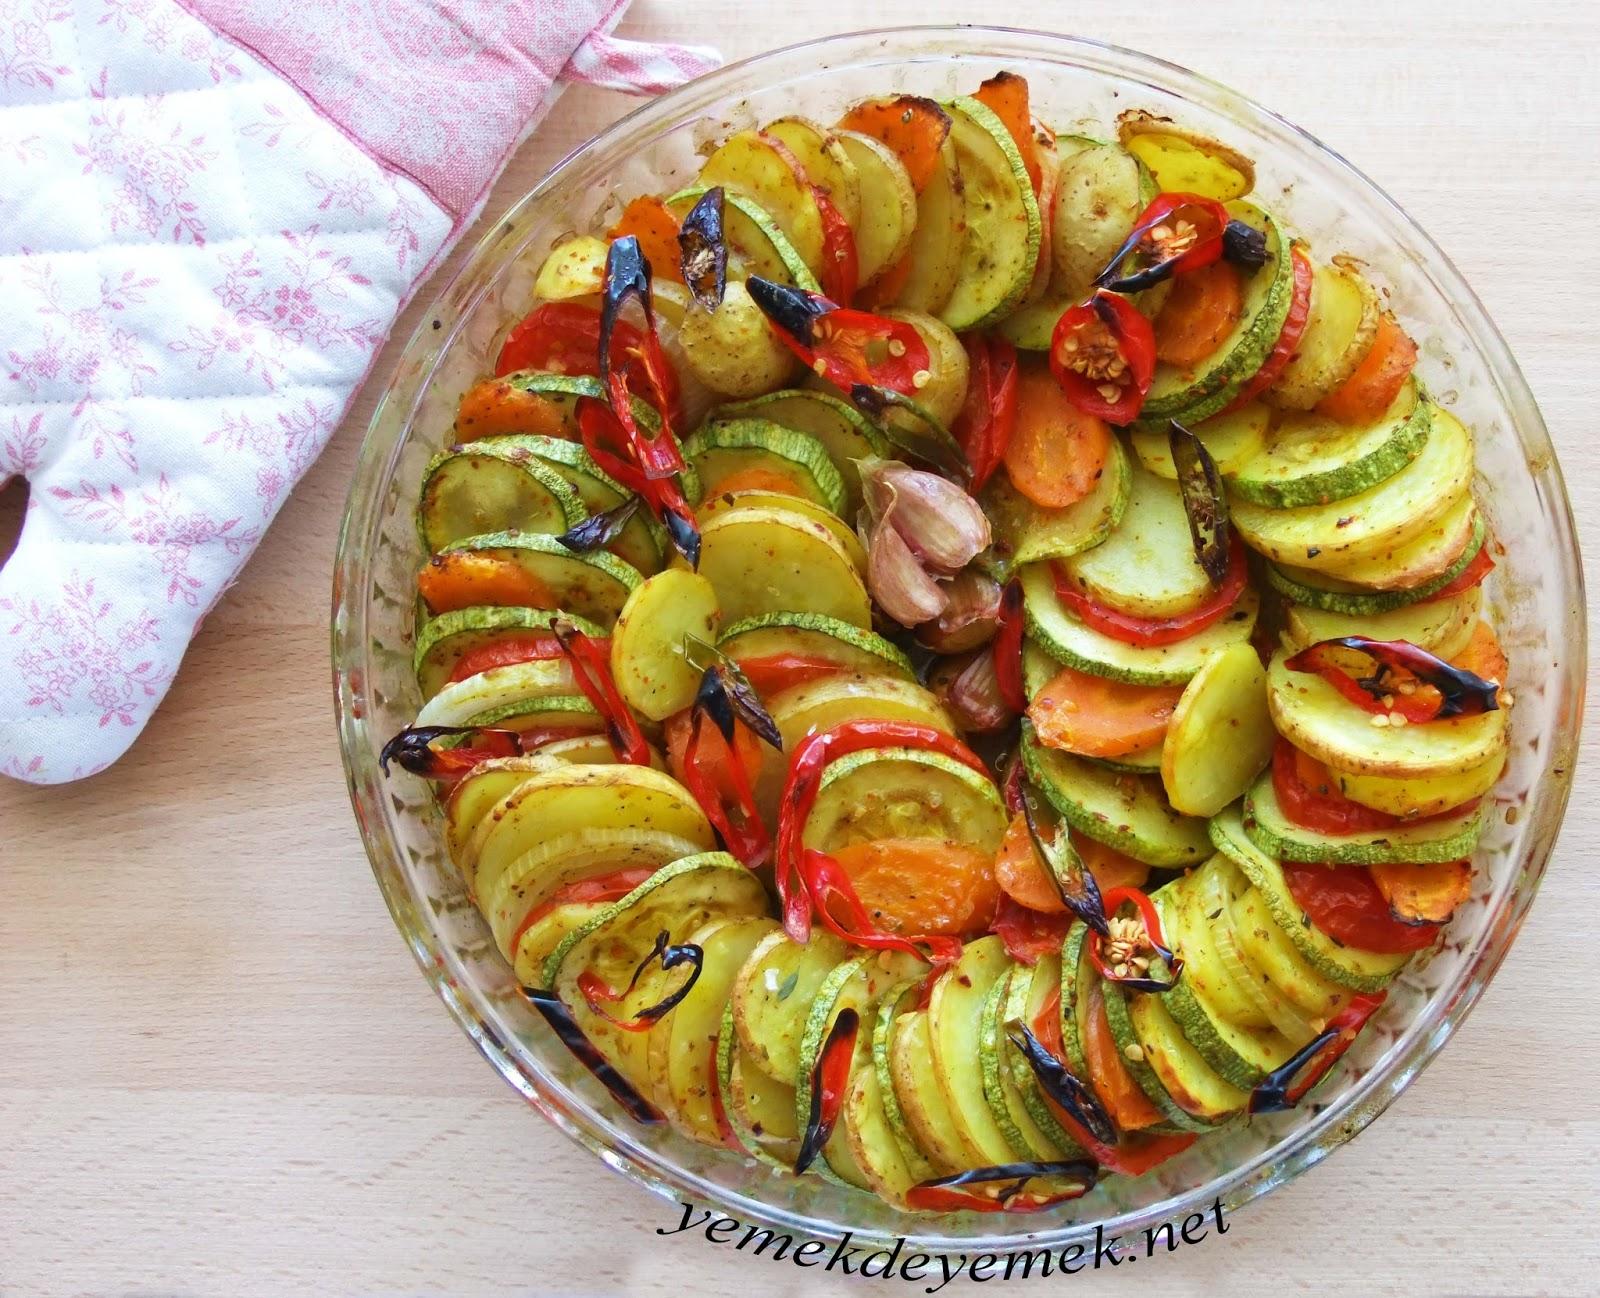 Sebzeli Karides Şiş Tarifi